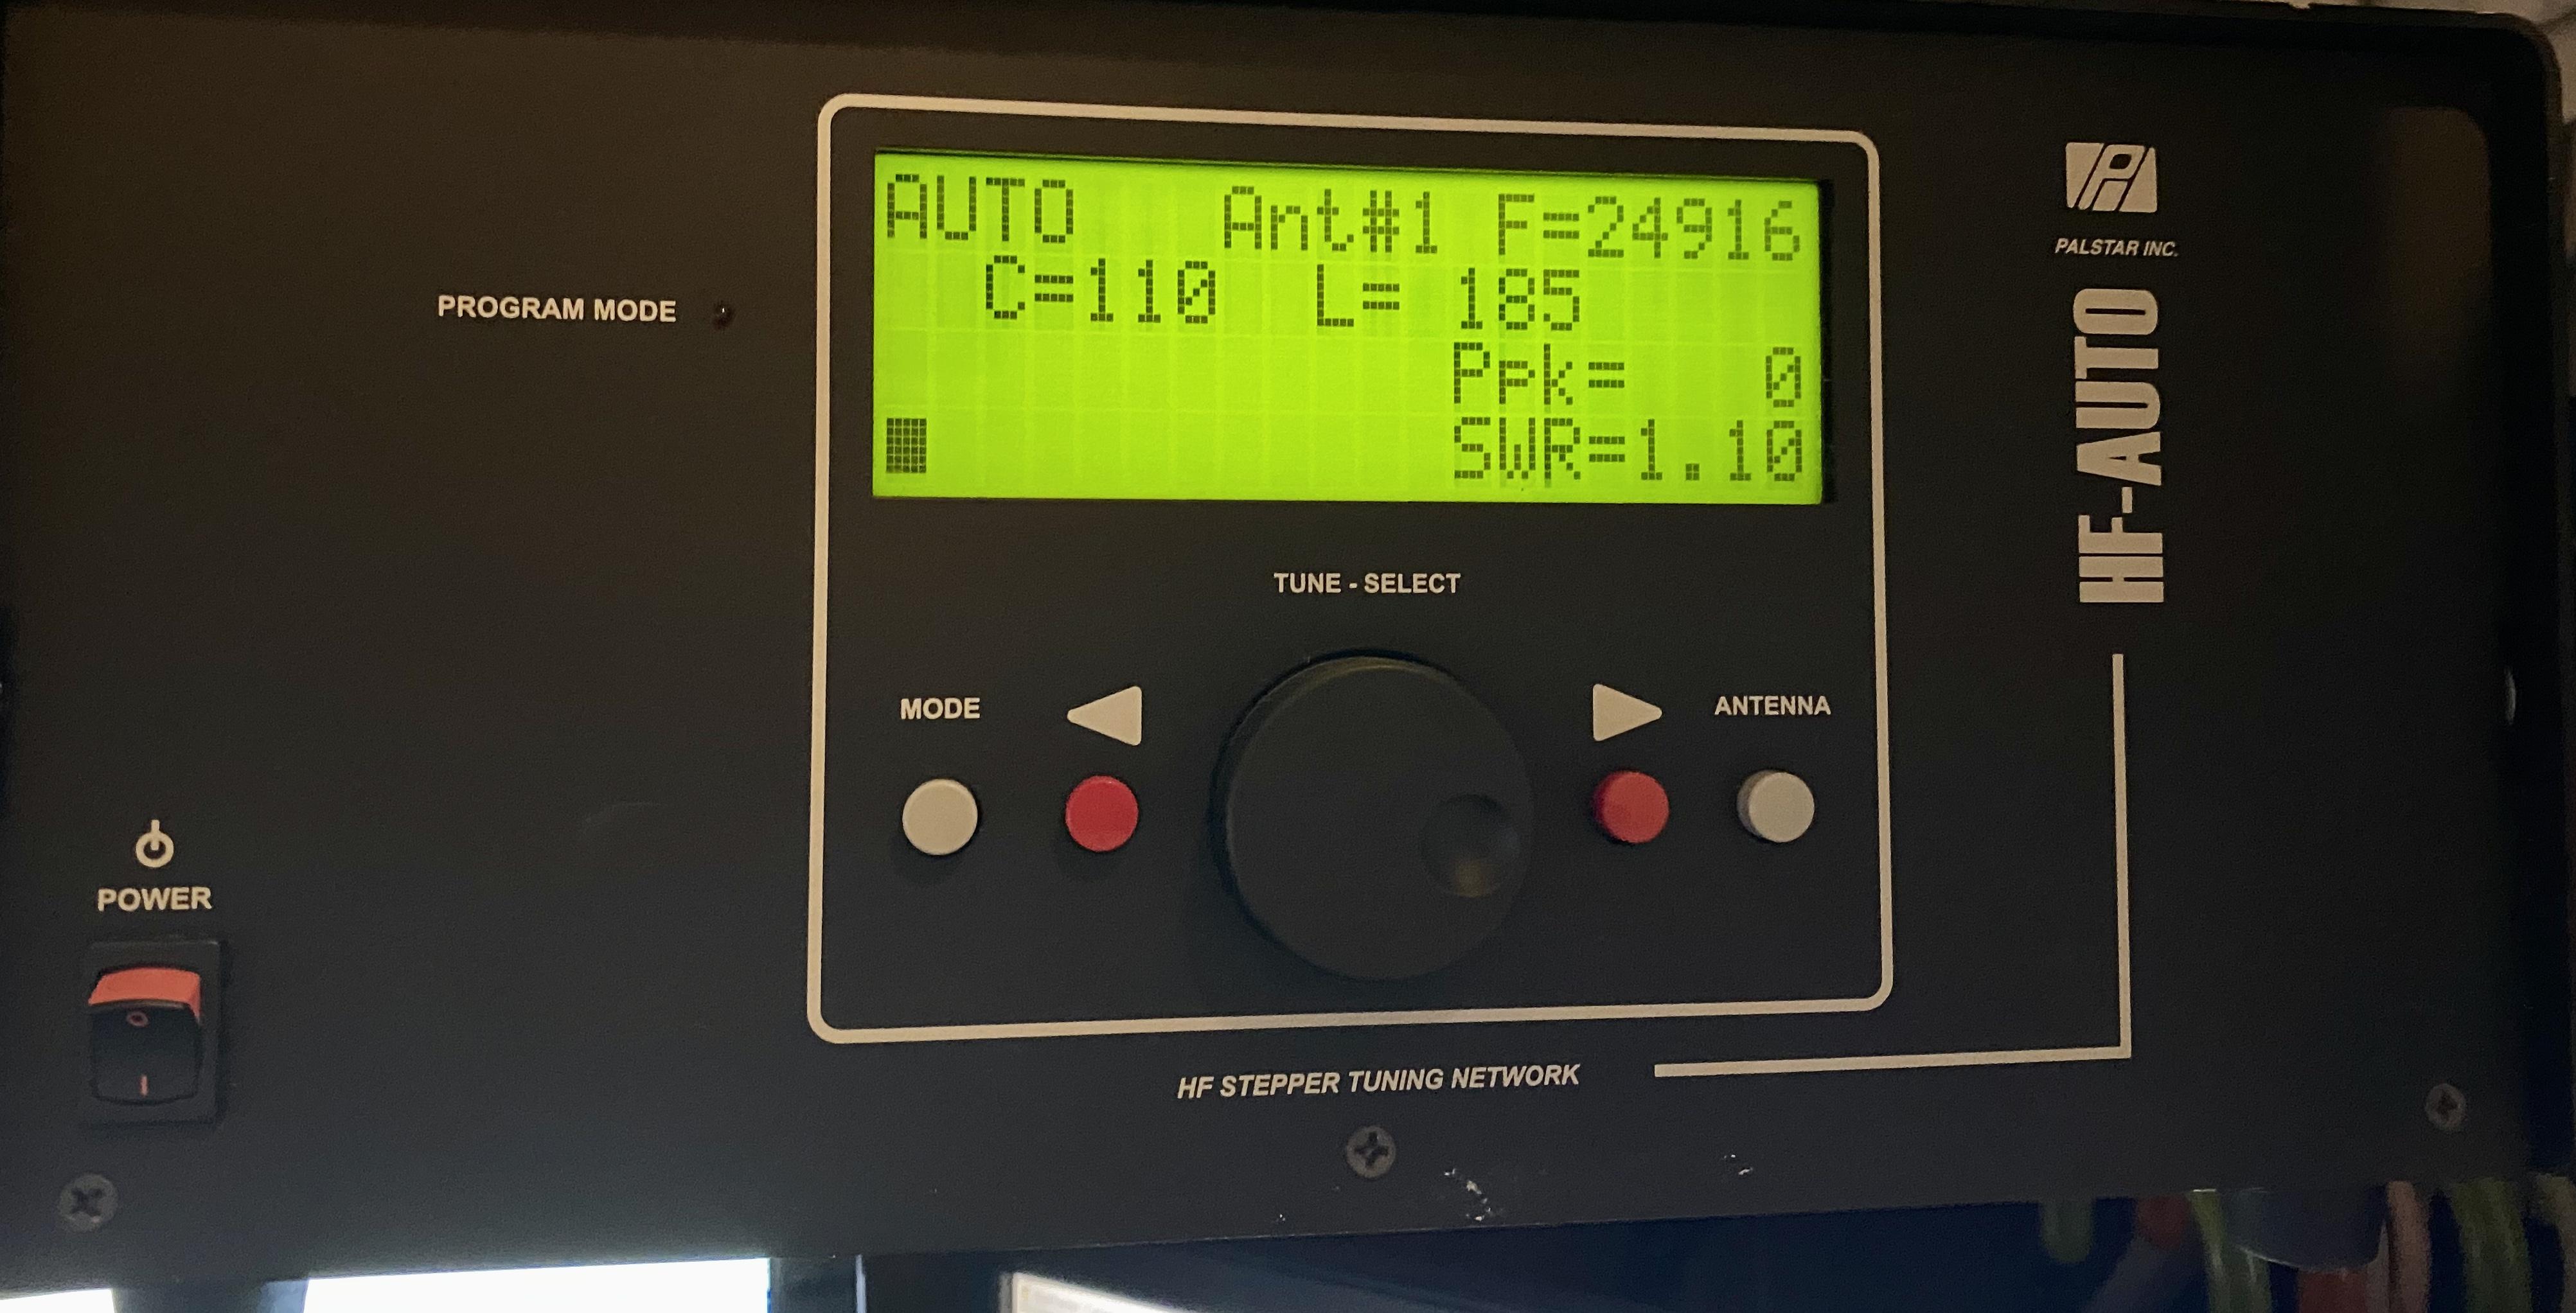 Palstar HF Autotuner